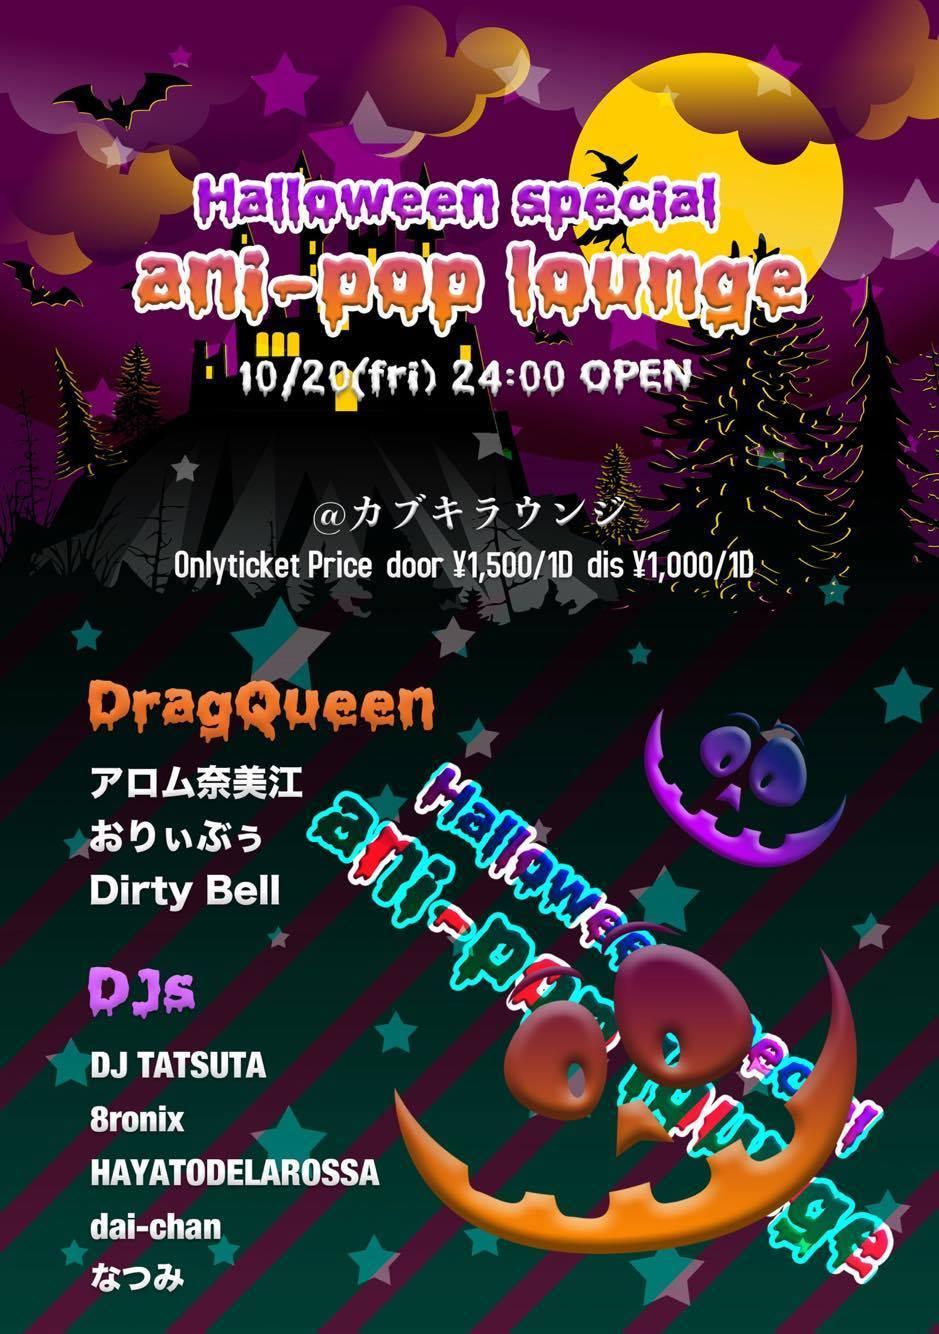 "10/20(fri)カブキラウンジ Halloween special ""ani-pop lounge"""